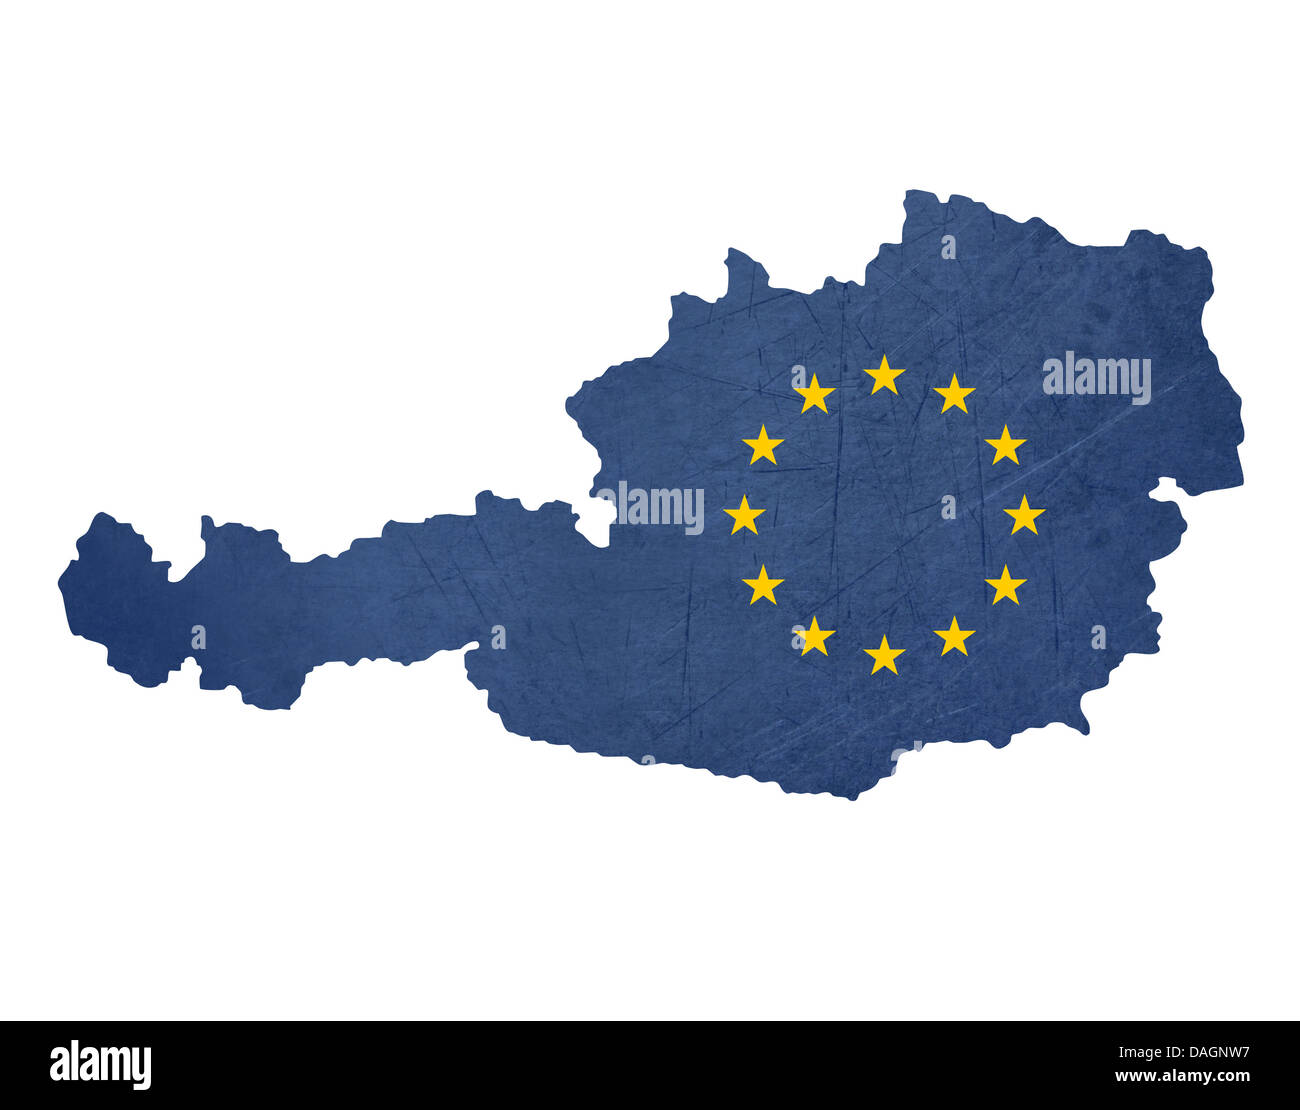 European Flag Map Of Austria Isolated On White Background.